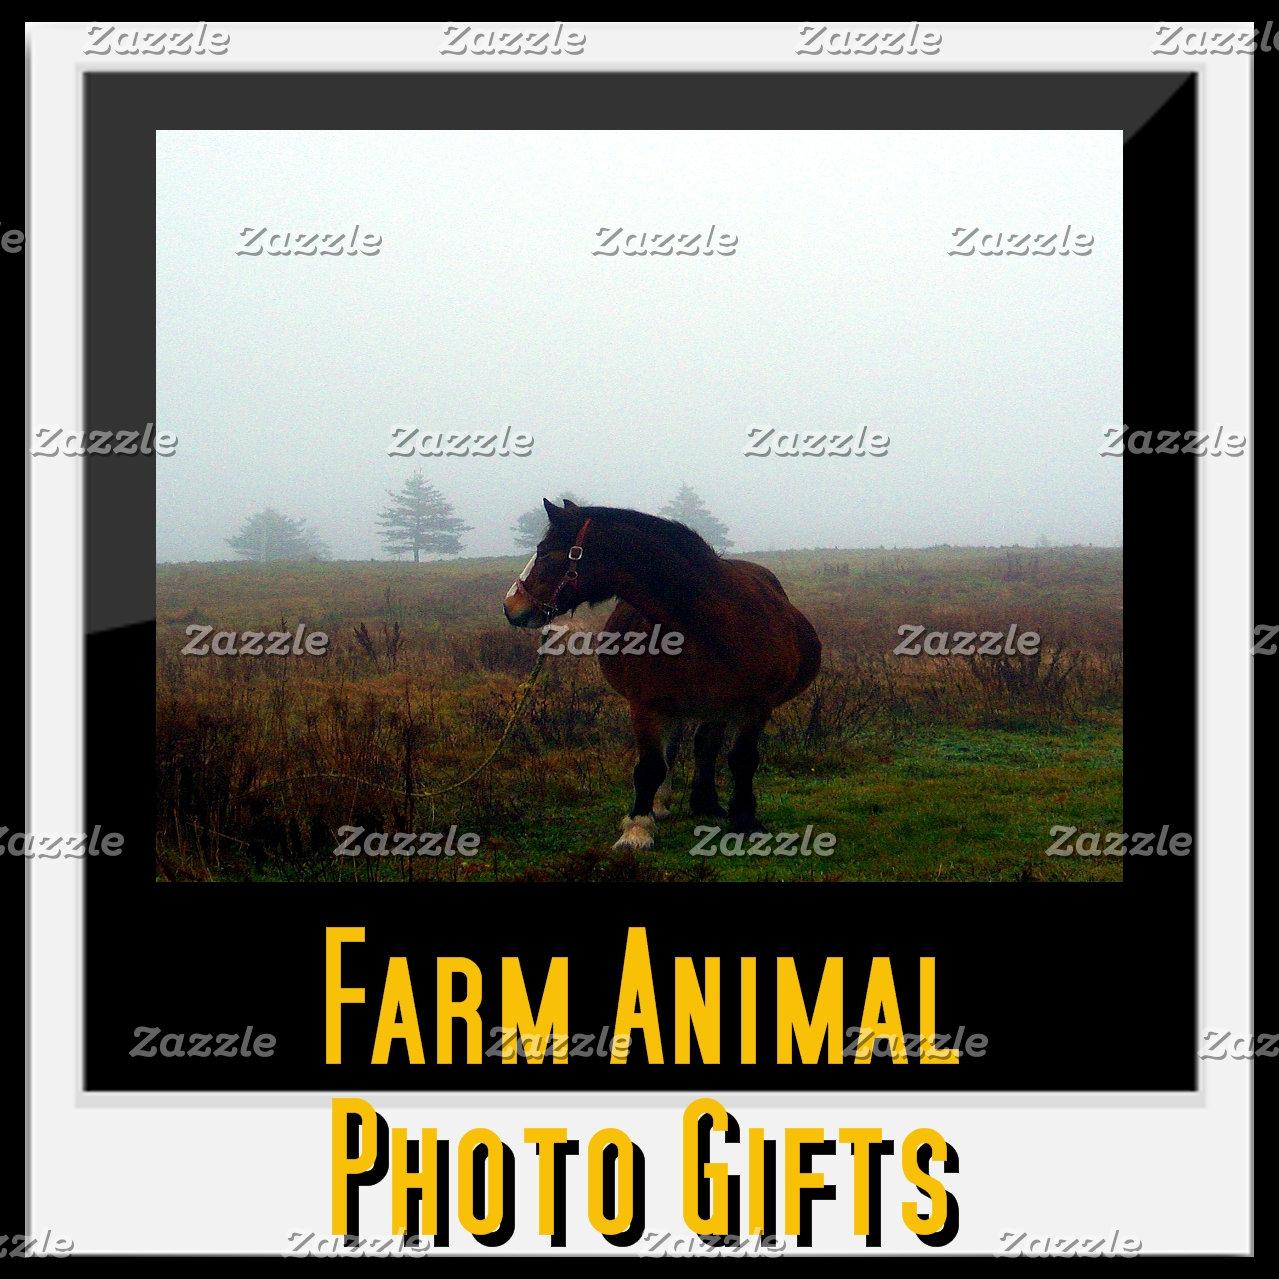 Farm Animal Photo Gifts